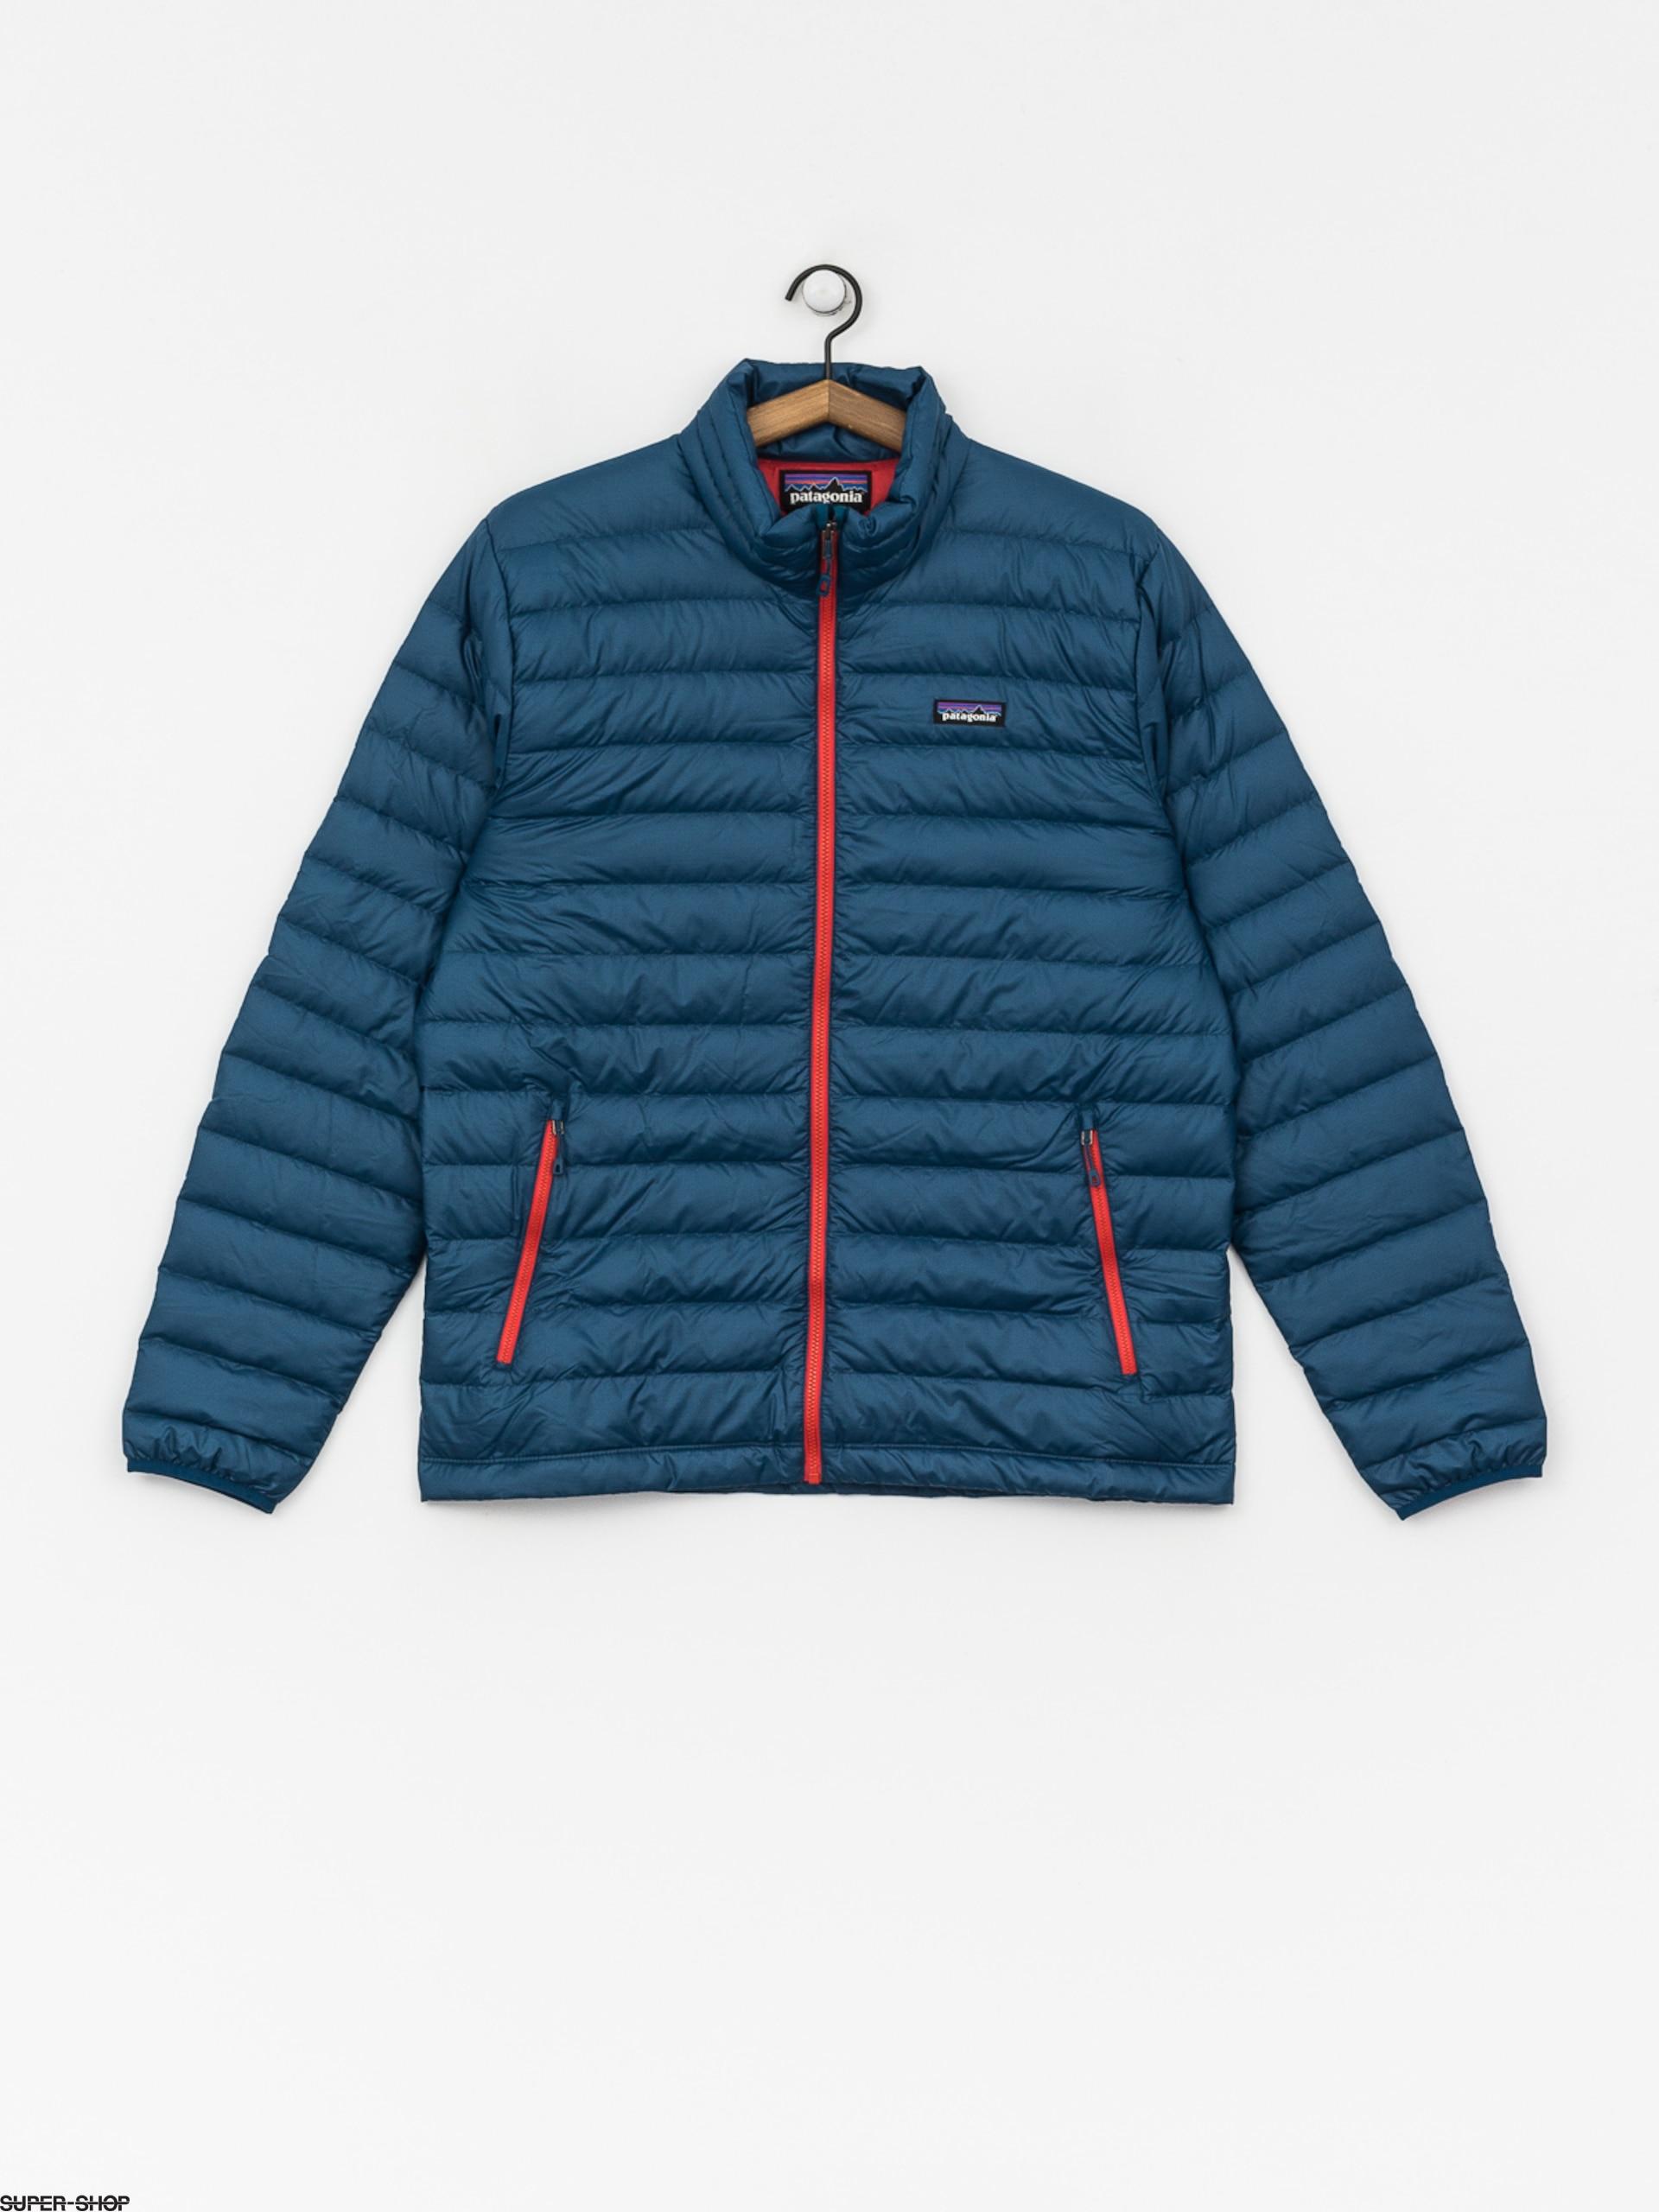 buy online fc0ac 27b03 Patagonia Jacke Down Sweater (big sur blue w/fire red)